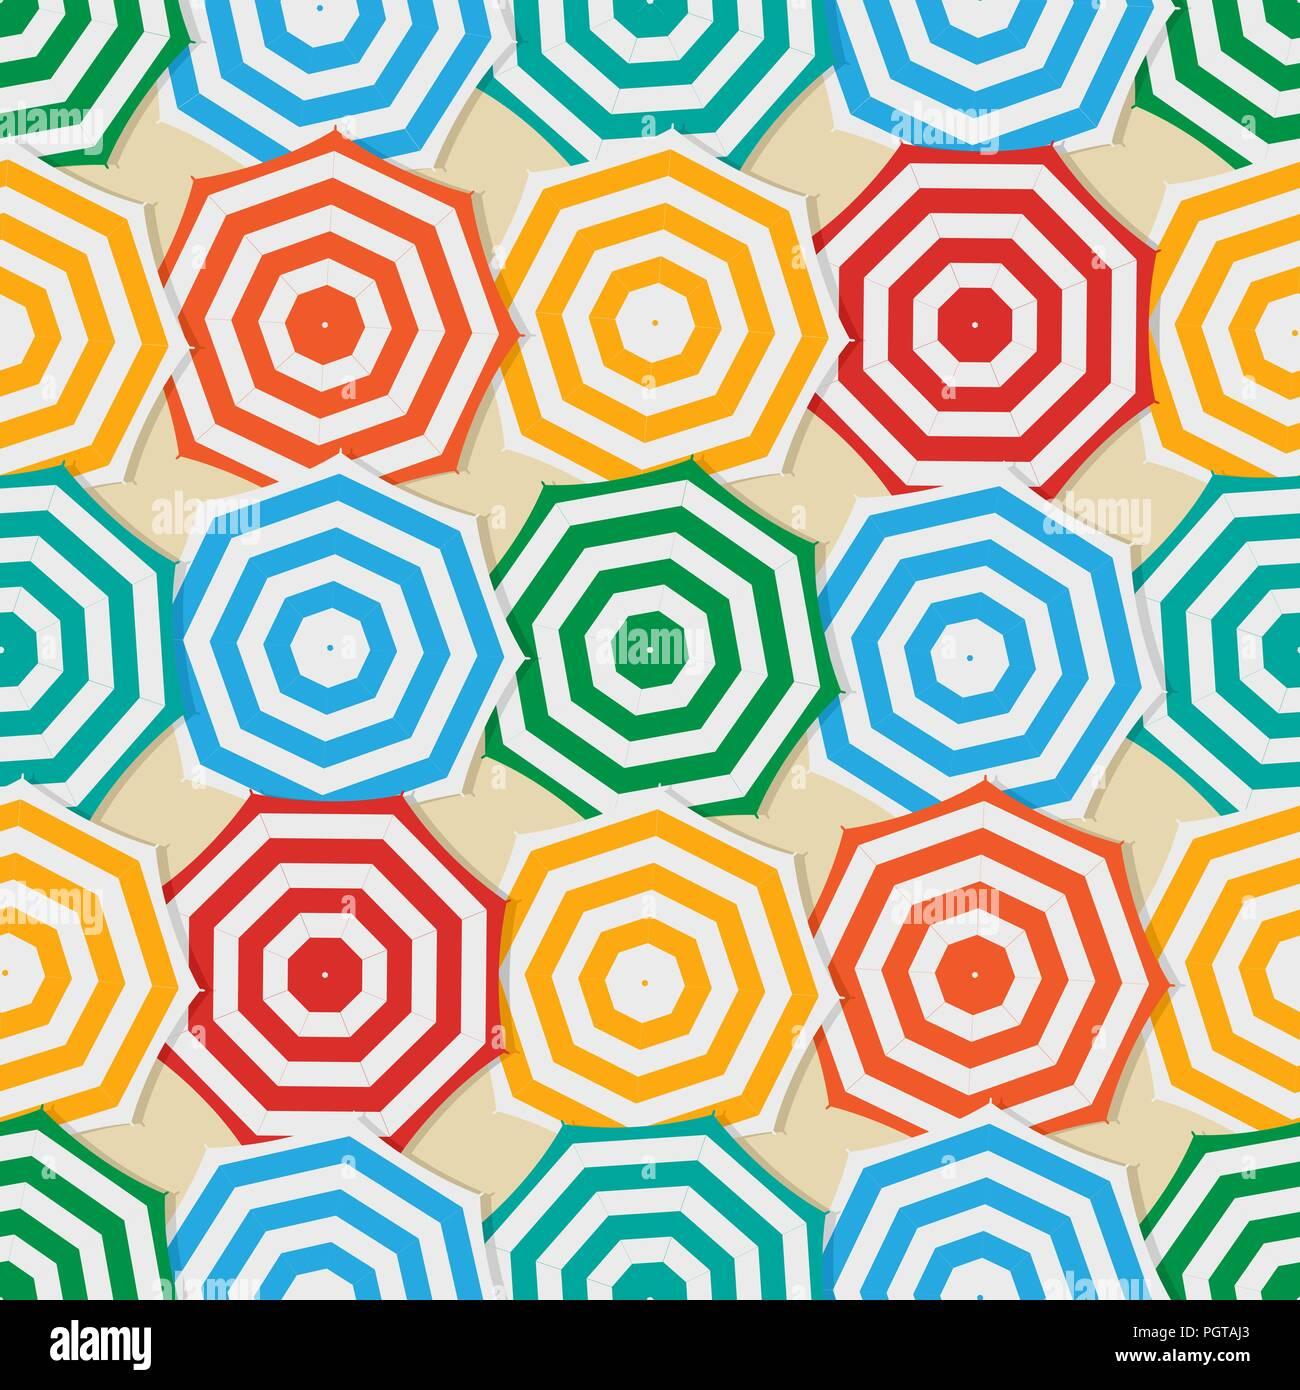 Seamless pattern design with beach umbrellas - Stock Image